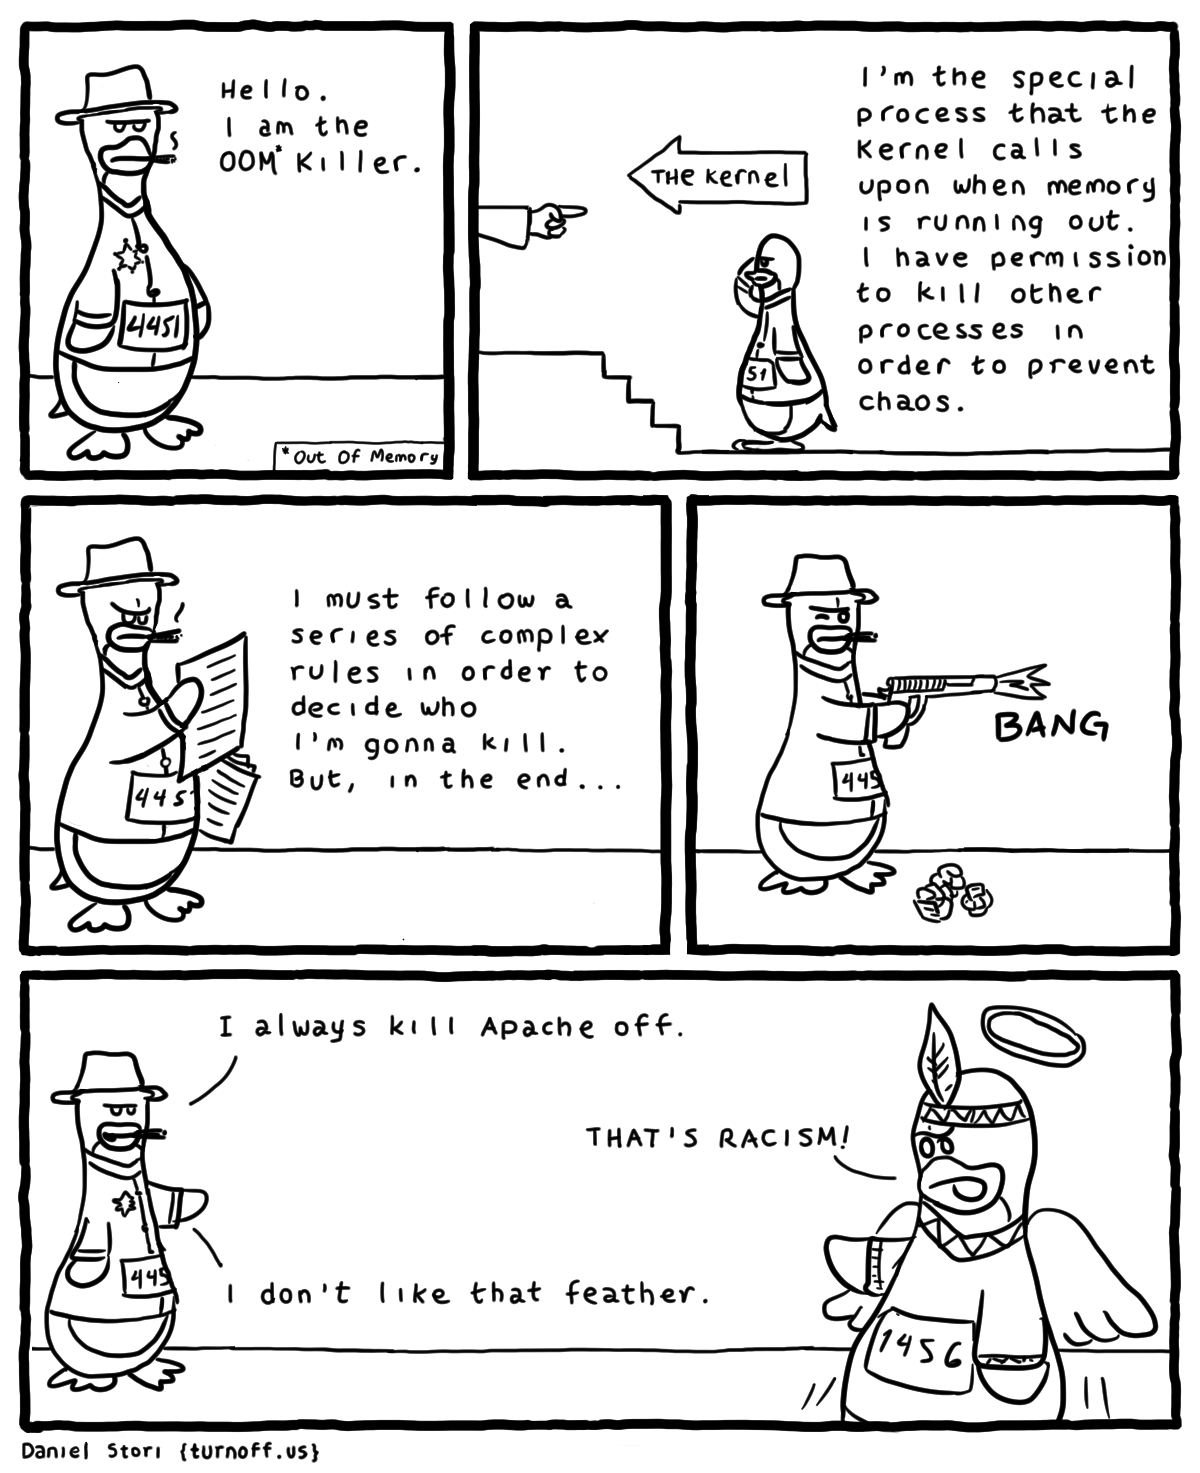 oom-killer